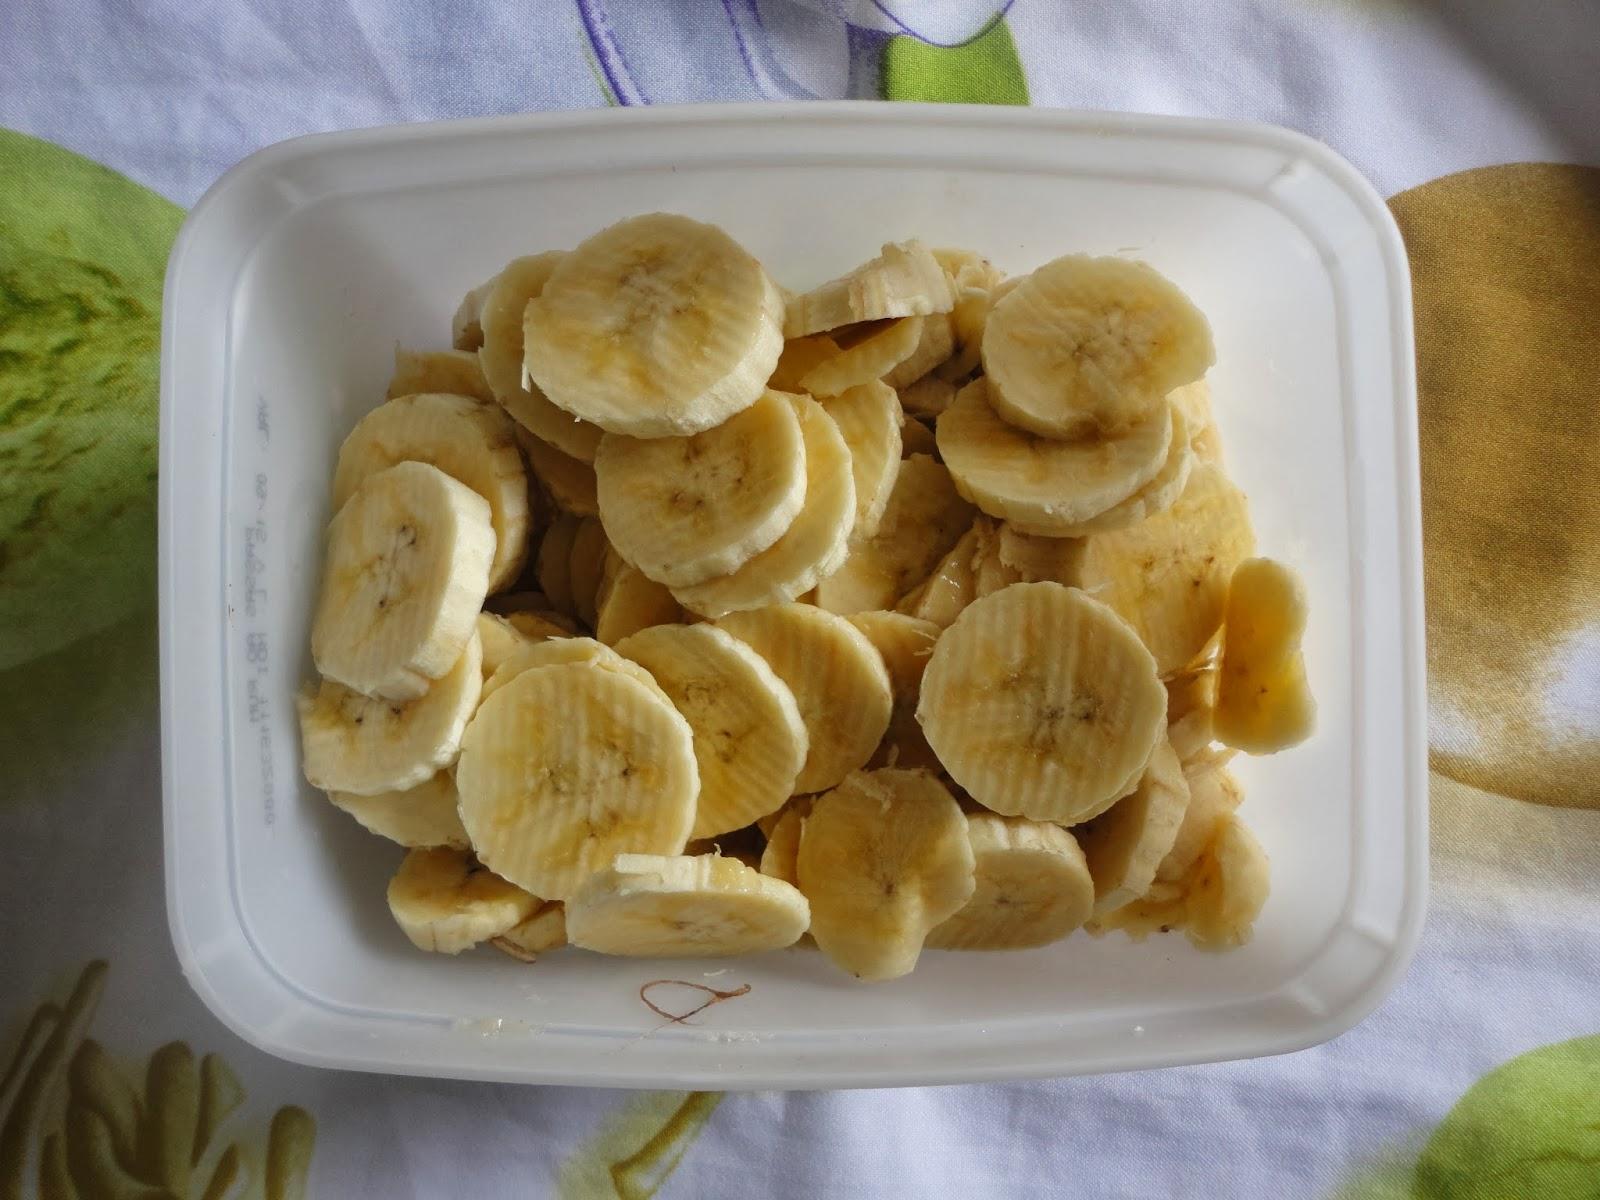 Sorvete delicioso de banana e banana com morangos!!! Faça